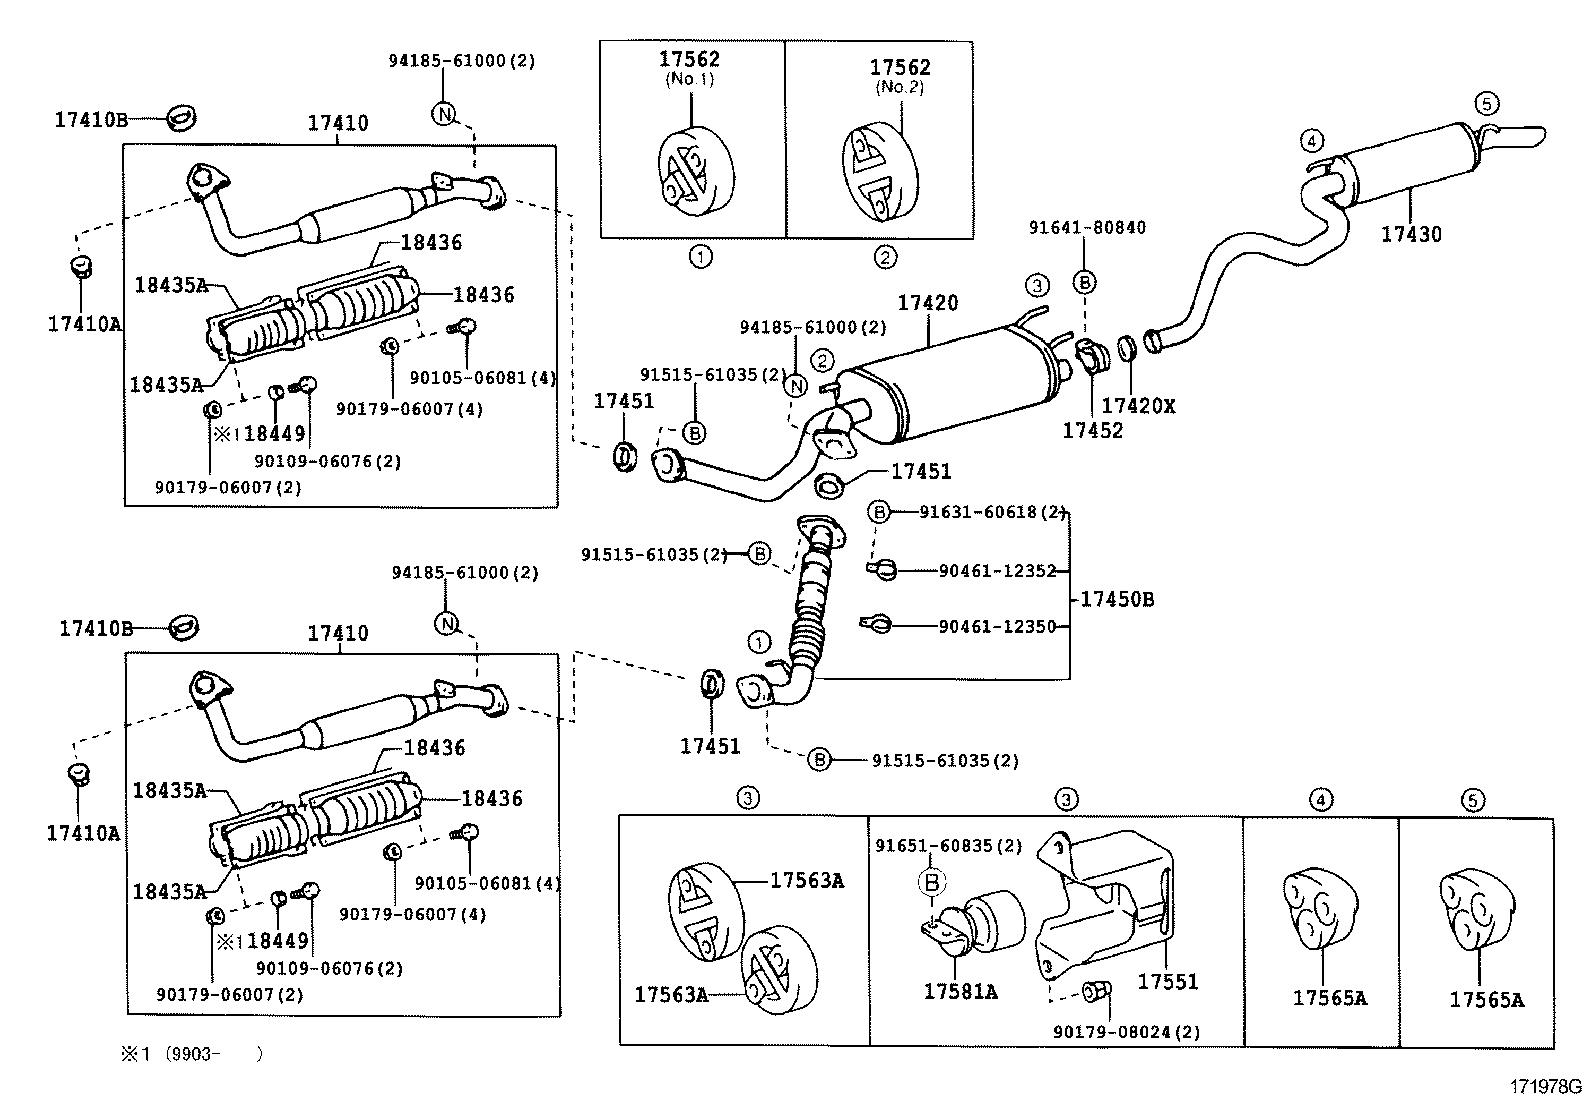 1991 toyota camry wiring diagram